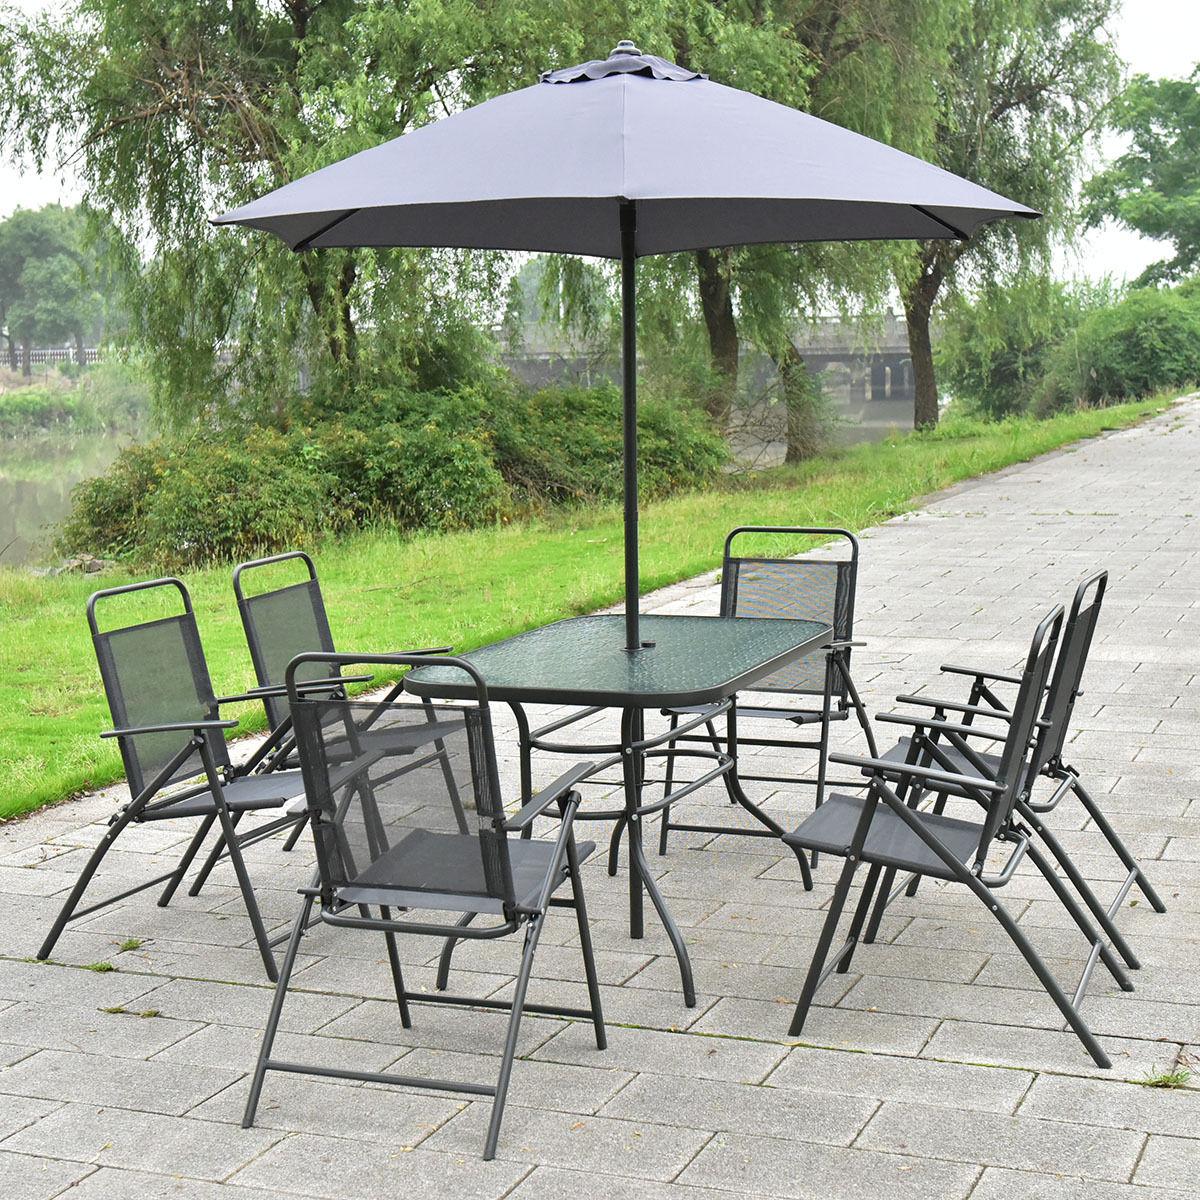 8 pcs Outdoor Patio Square Folding Furniture Set with Umbrella